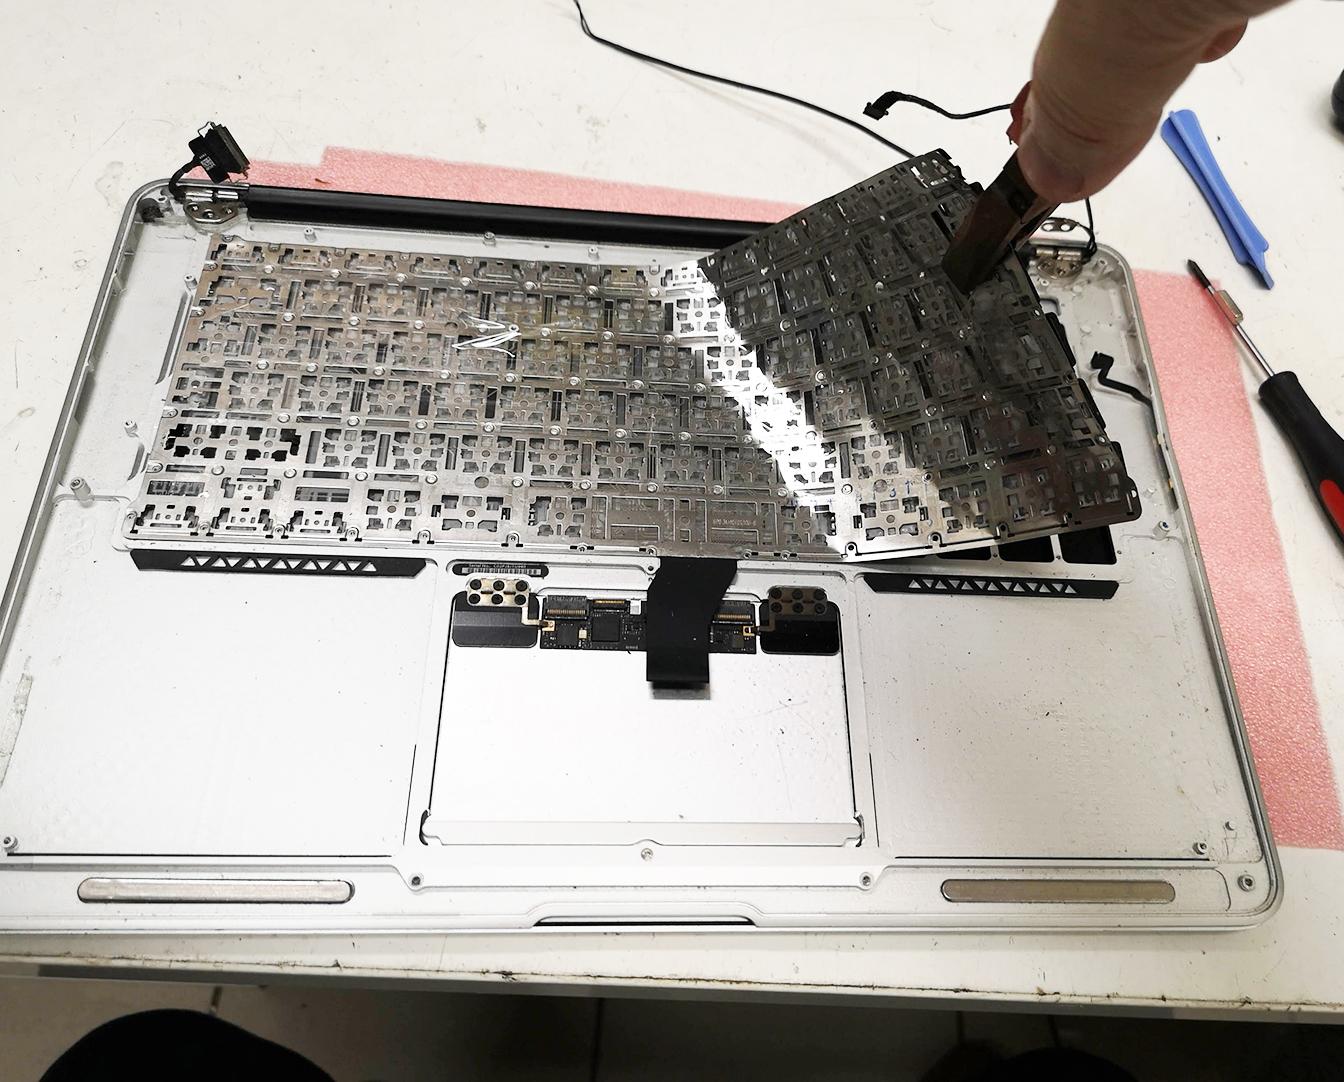 Apple Mac MacBook iMac Repairs Service Center Sydney | Enmore